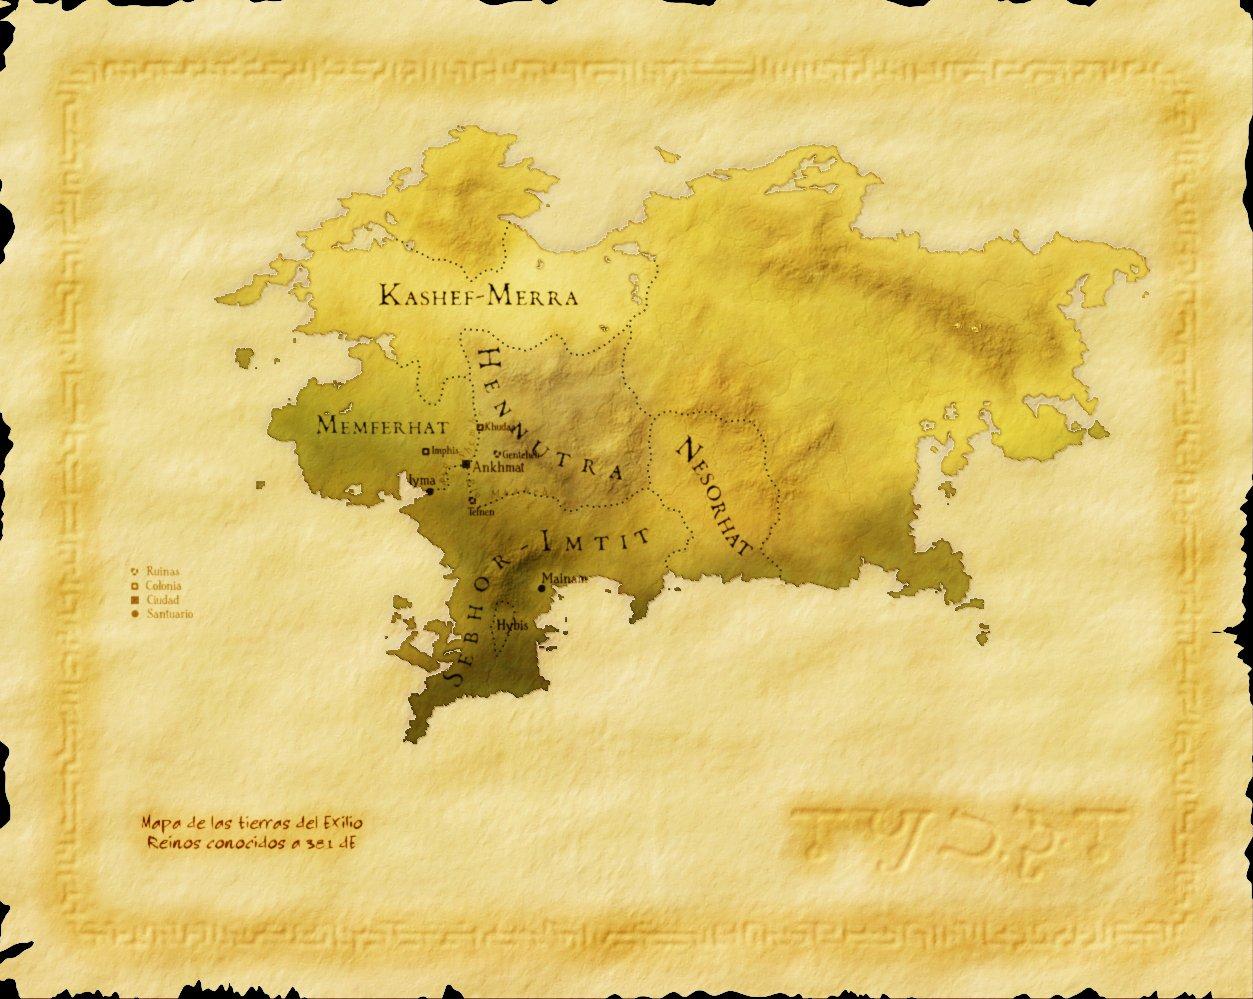 Mapa original del Exilio